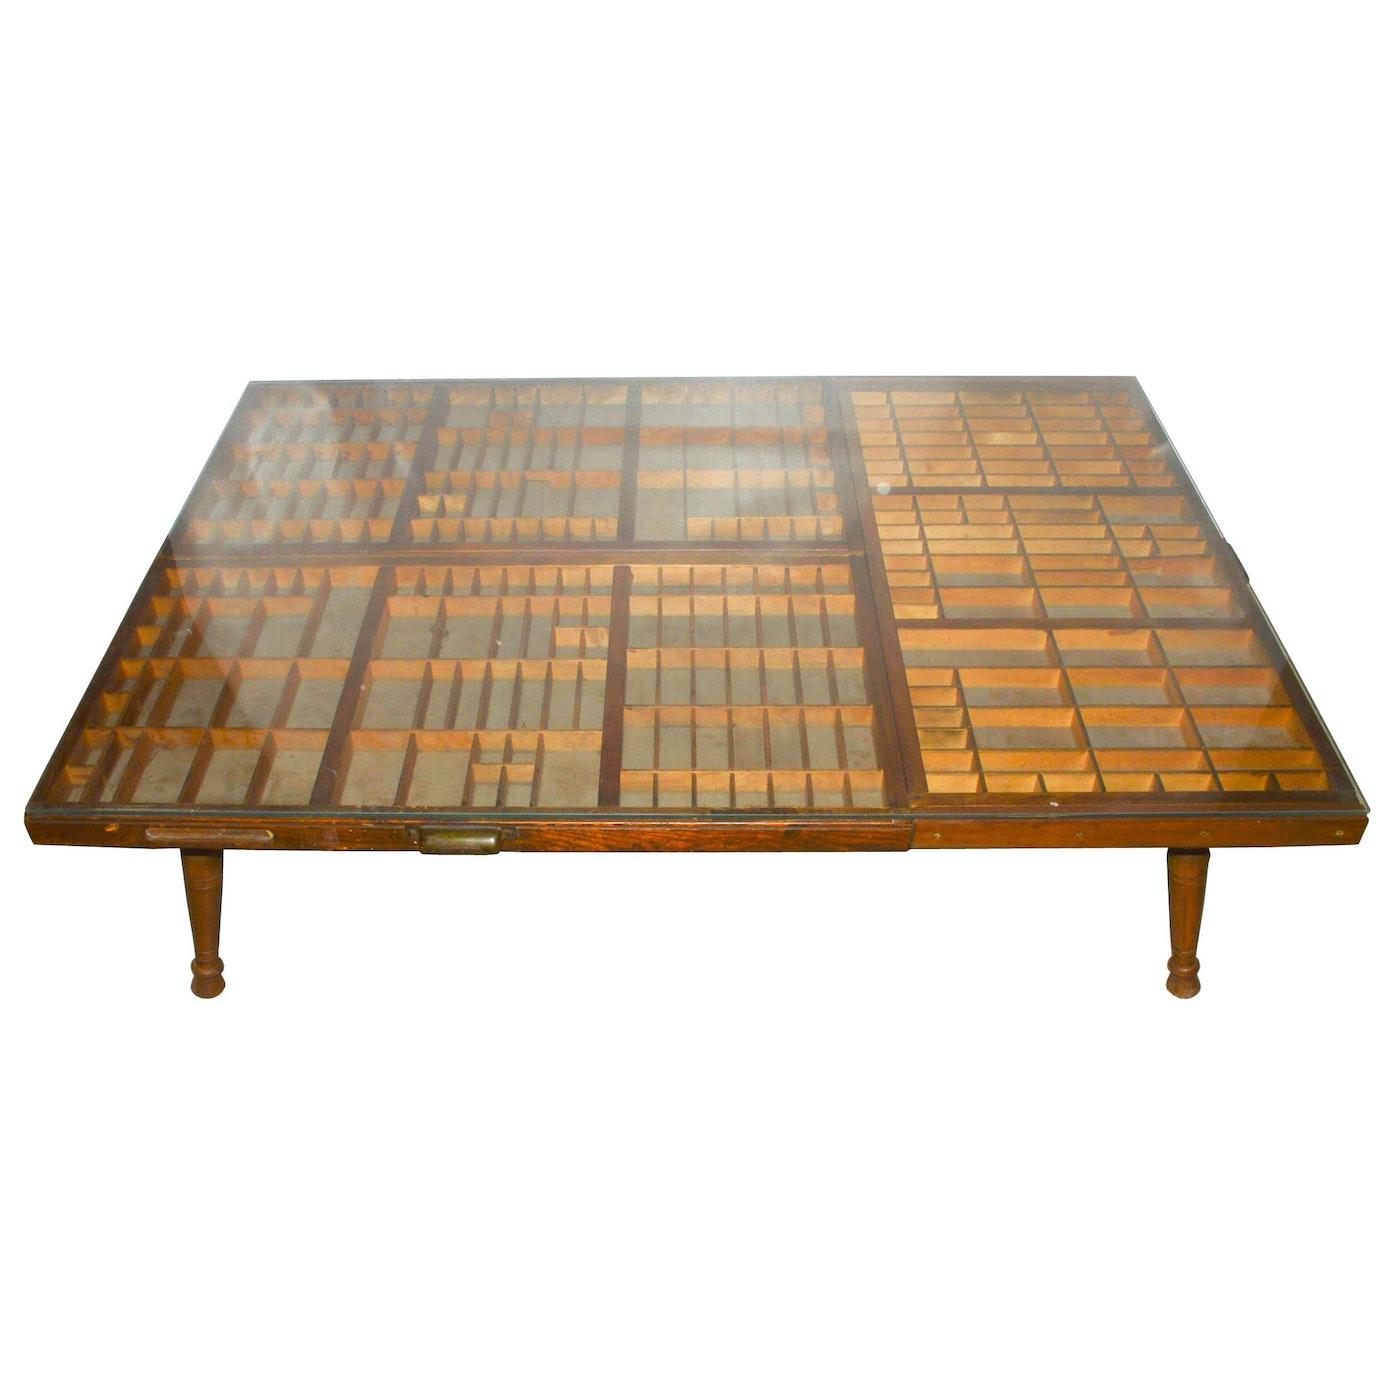 Unique Coffee Table Tray: Unique Repurposed Printer's Trays Glass-Top Coffee Table